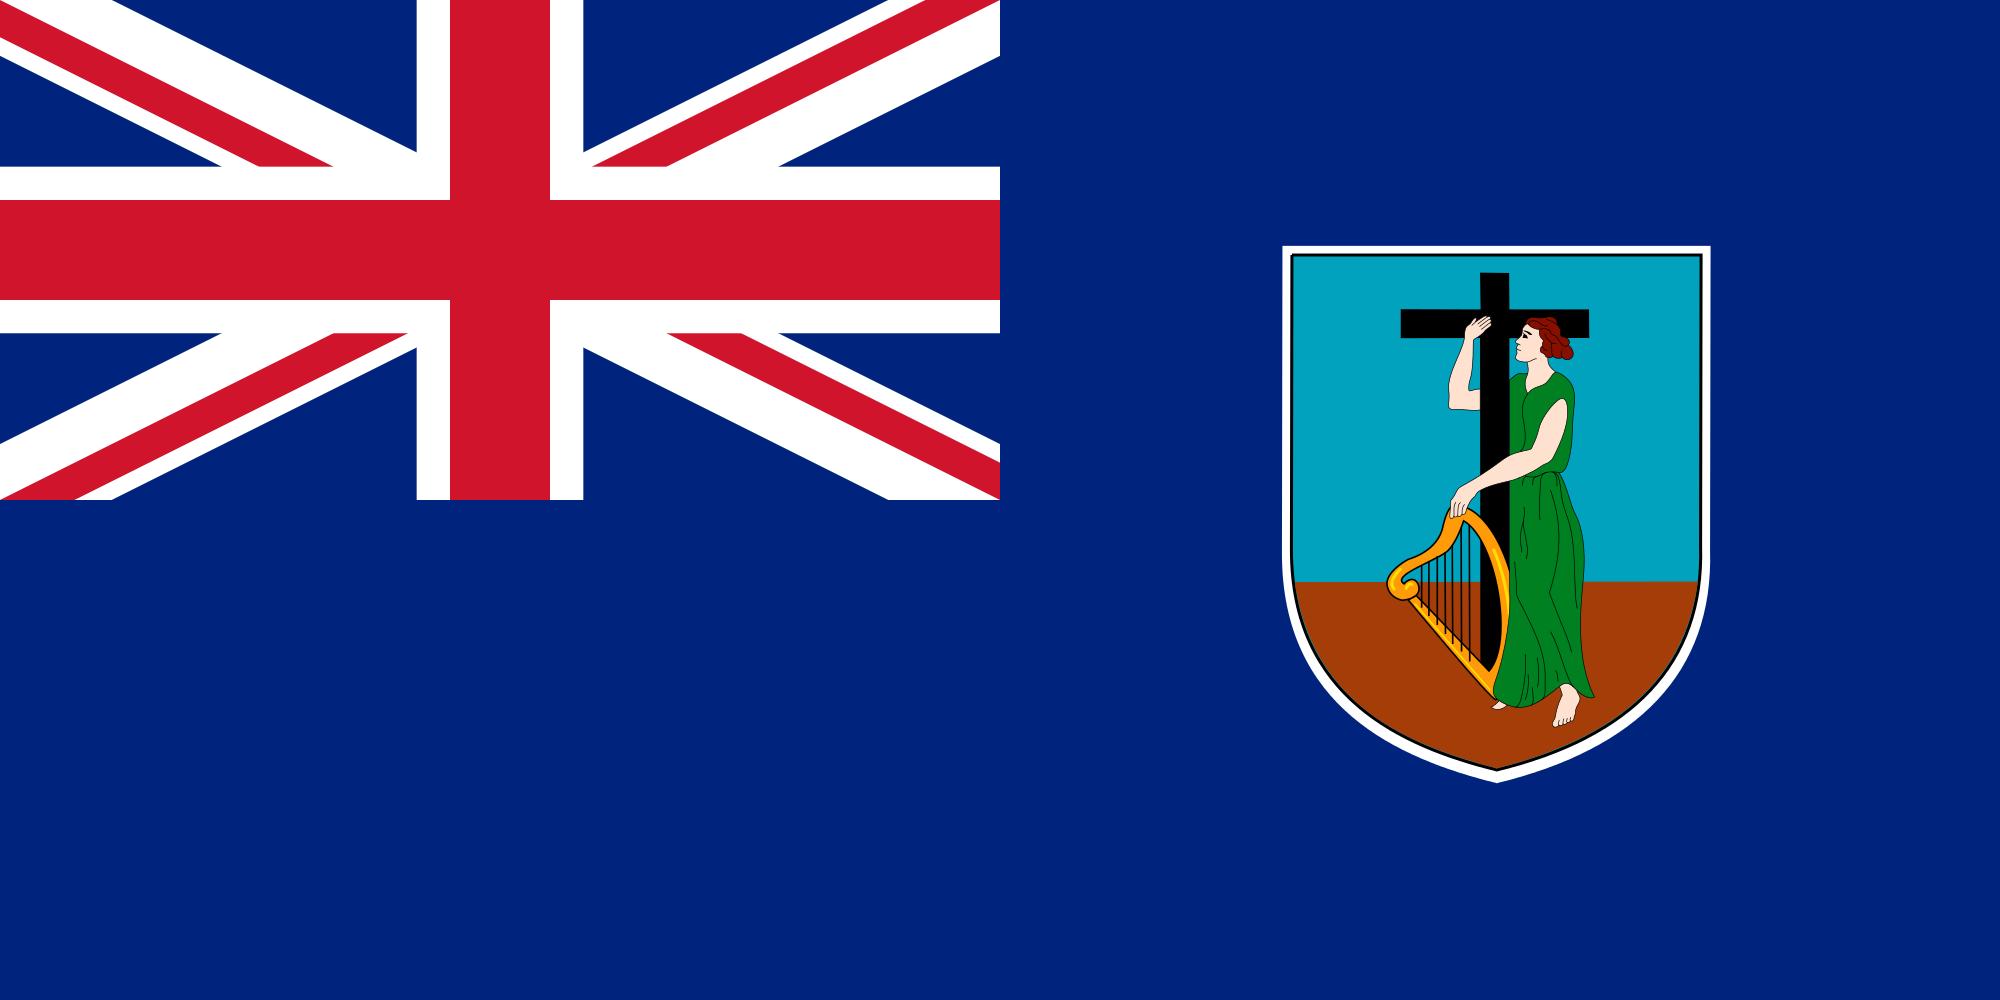 Montserrat, país, Brasão de armas, logotipo, símbolo - Papéis de parede HD - Professor-falken.com